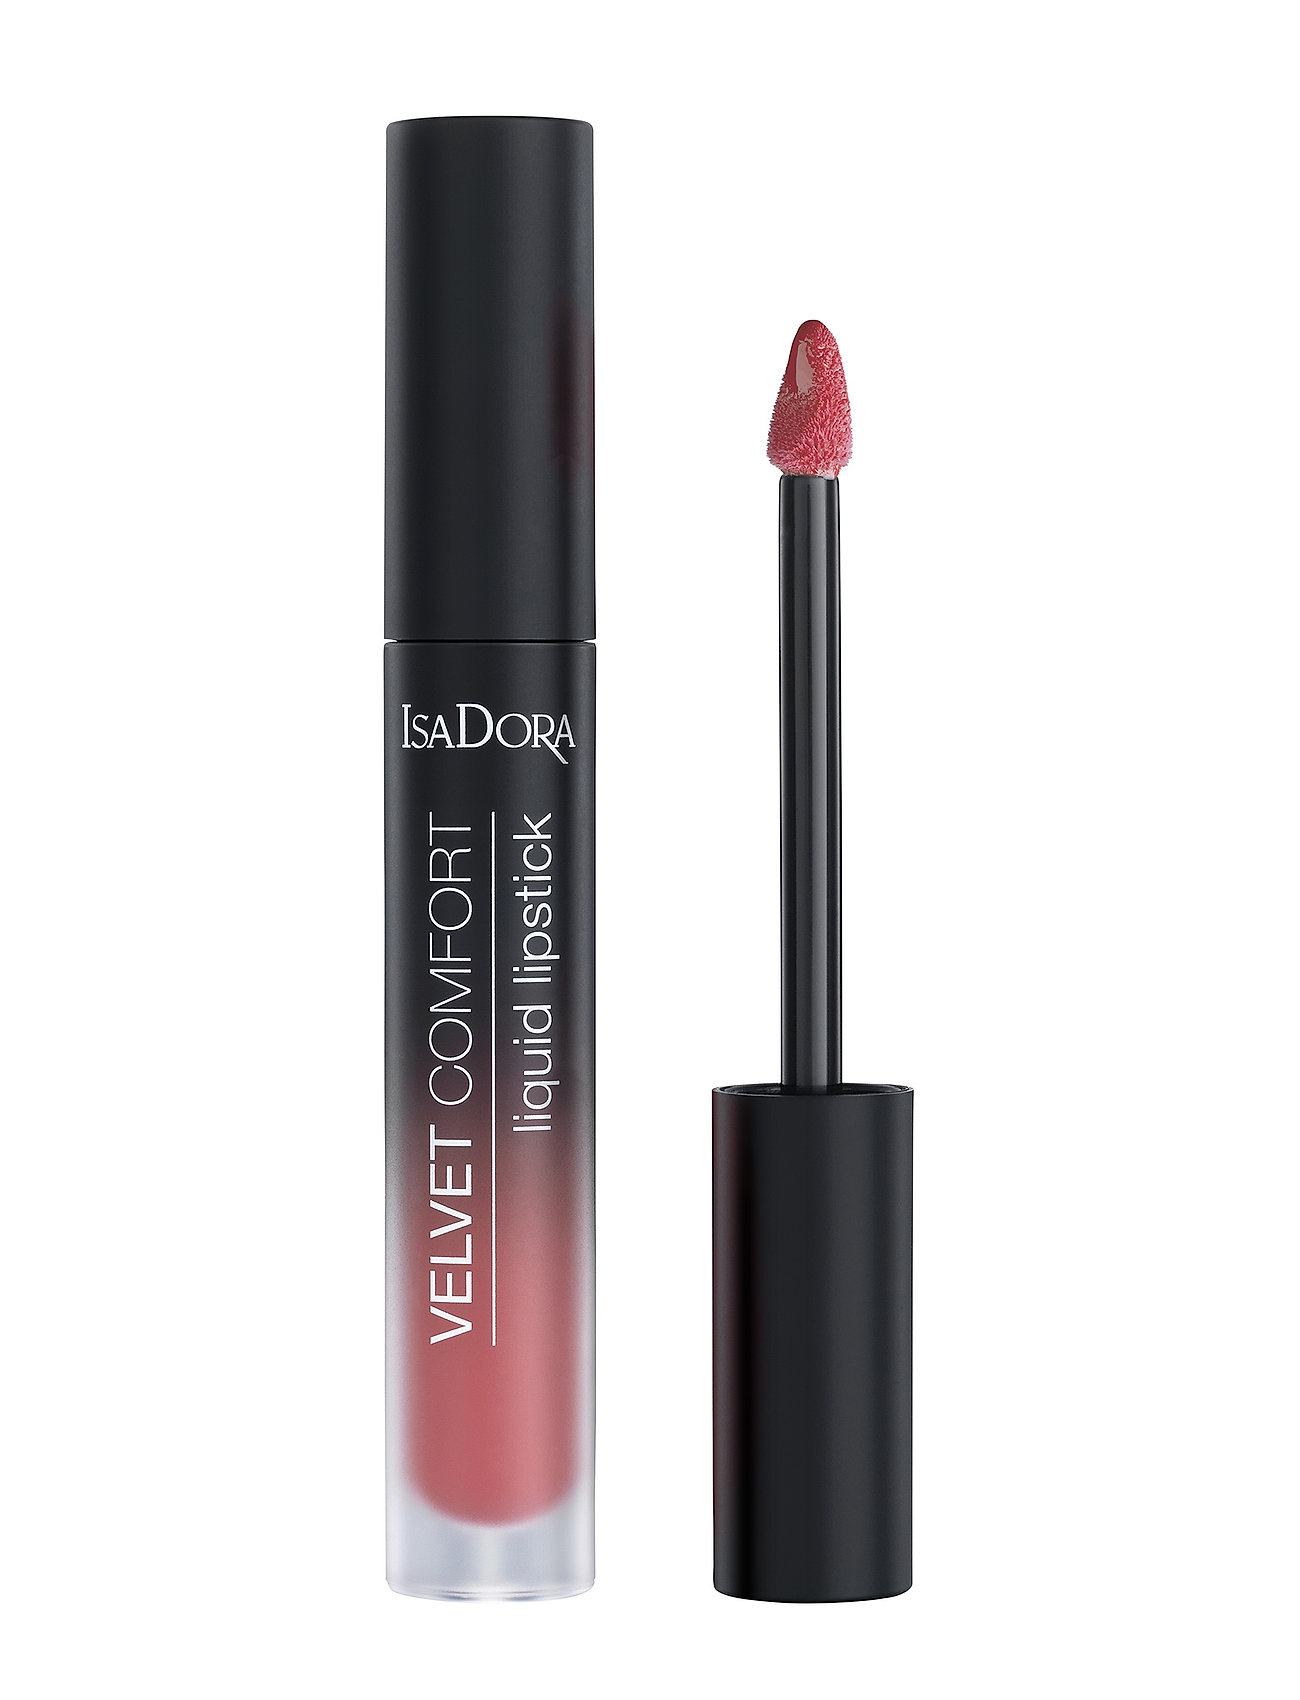 Isadora - Velvet Comfort Liquid Lipstick Think Pink - liquid lipstick - think pink - 1